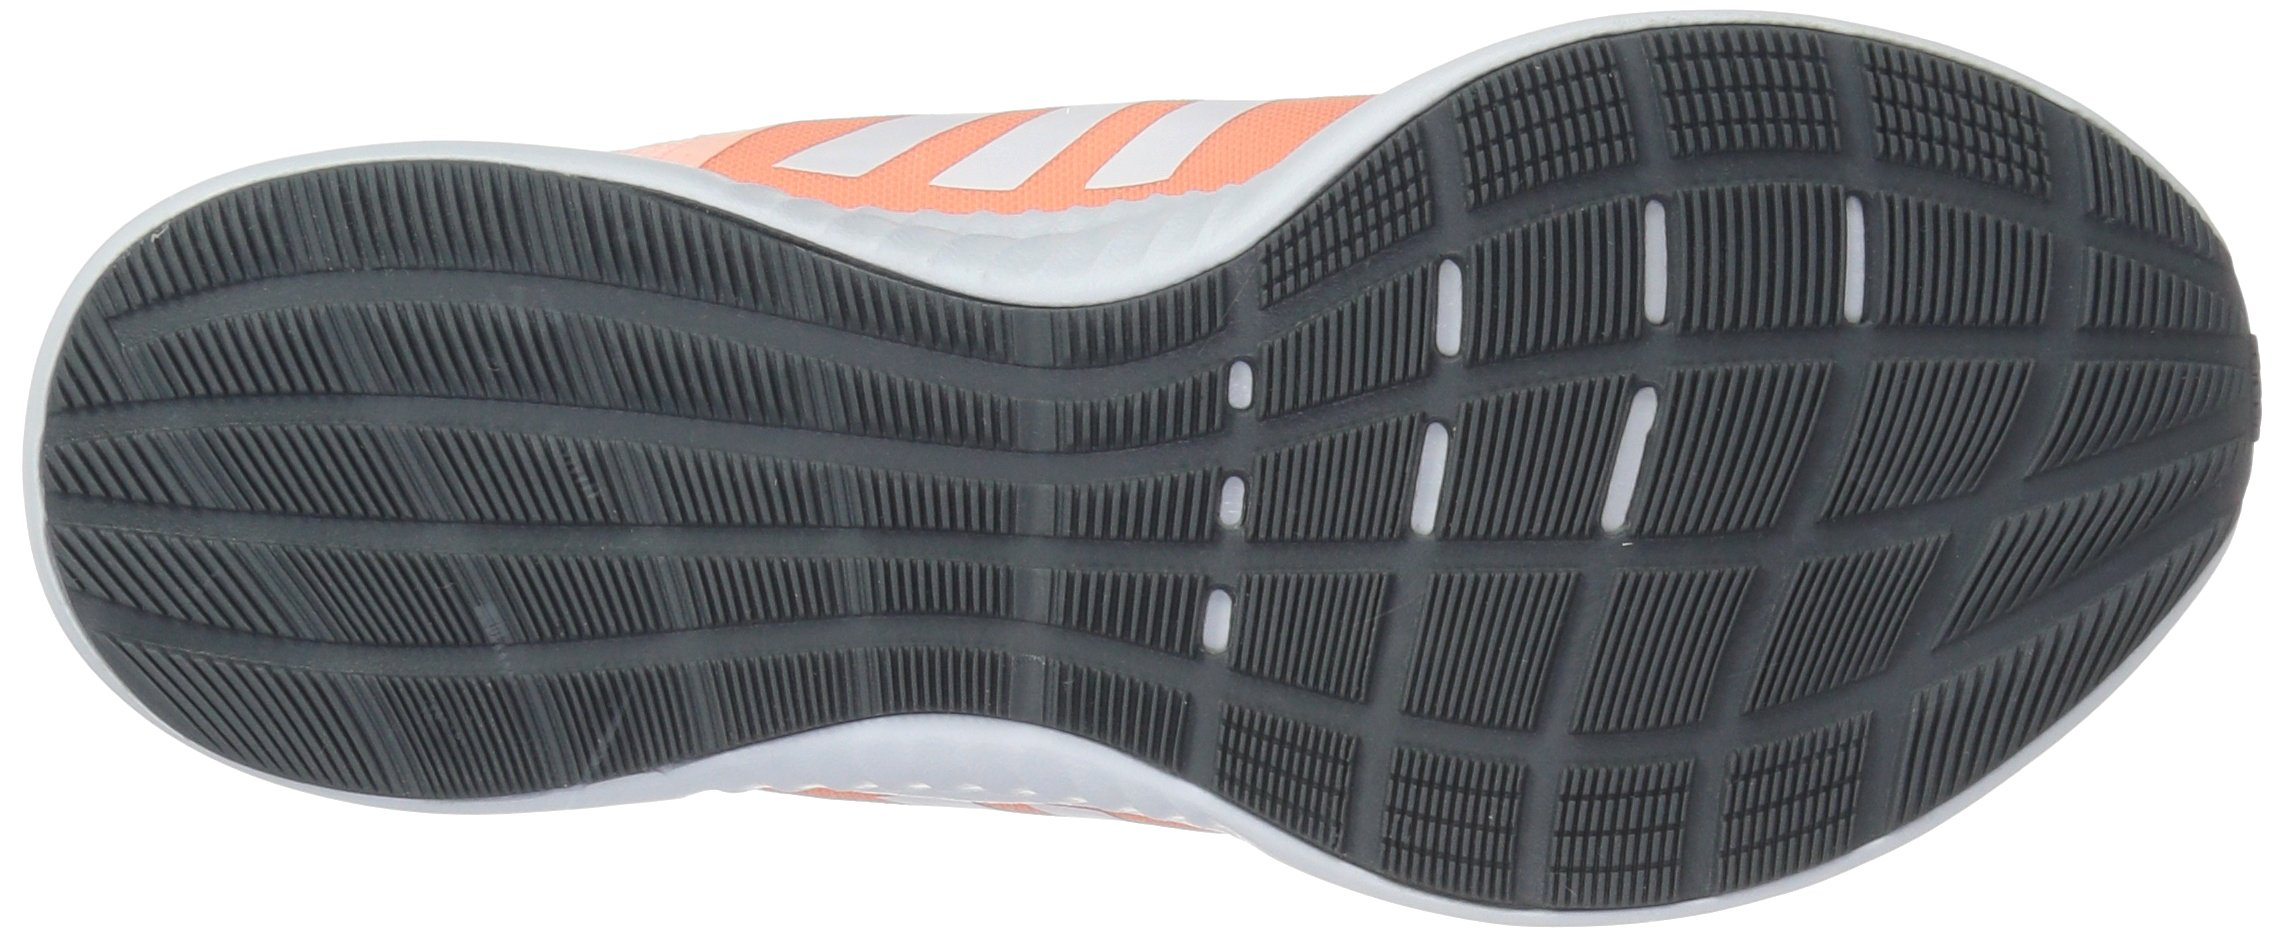 adidas Women's EdgeBounce Running Shoe Clear Orange/White/Copper Metallic 5 M US by adidas (Image #3)